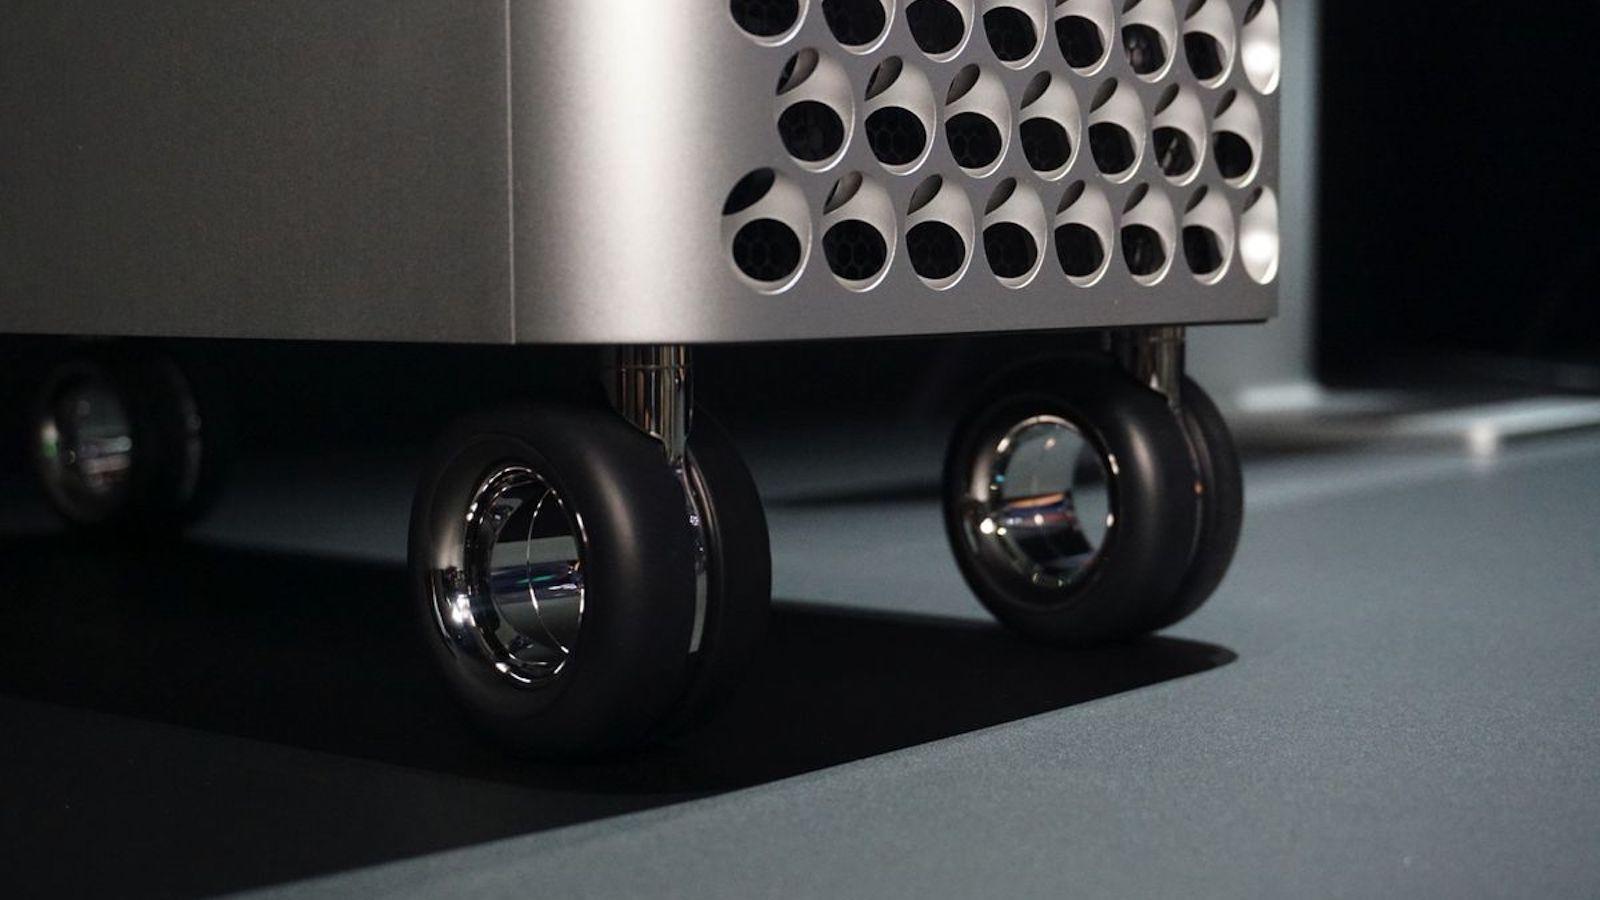 Apple Mac Pro Wheels Kit Computer Rollers